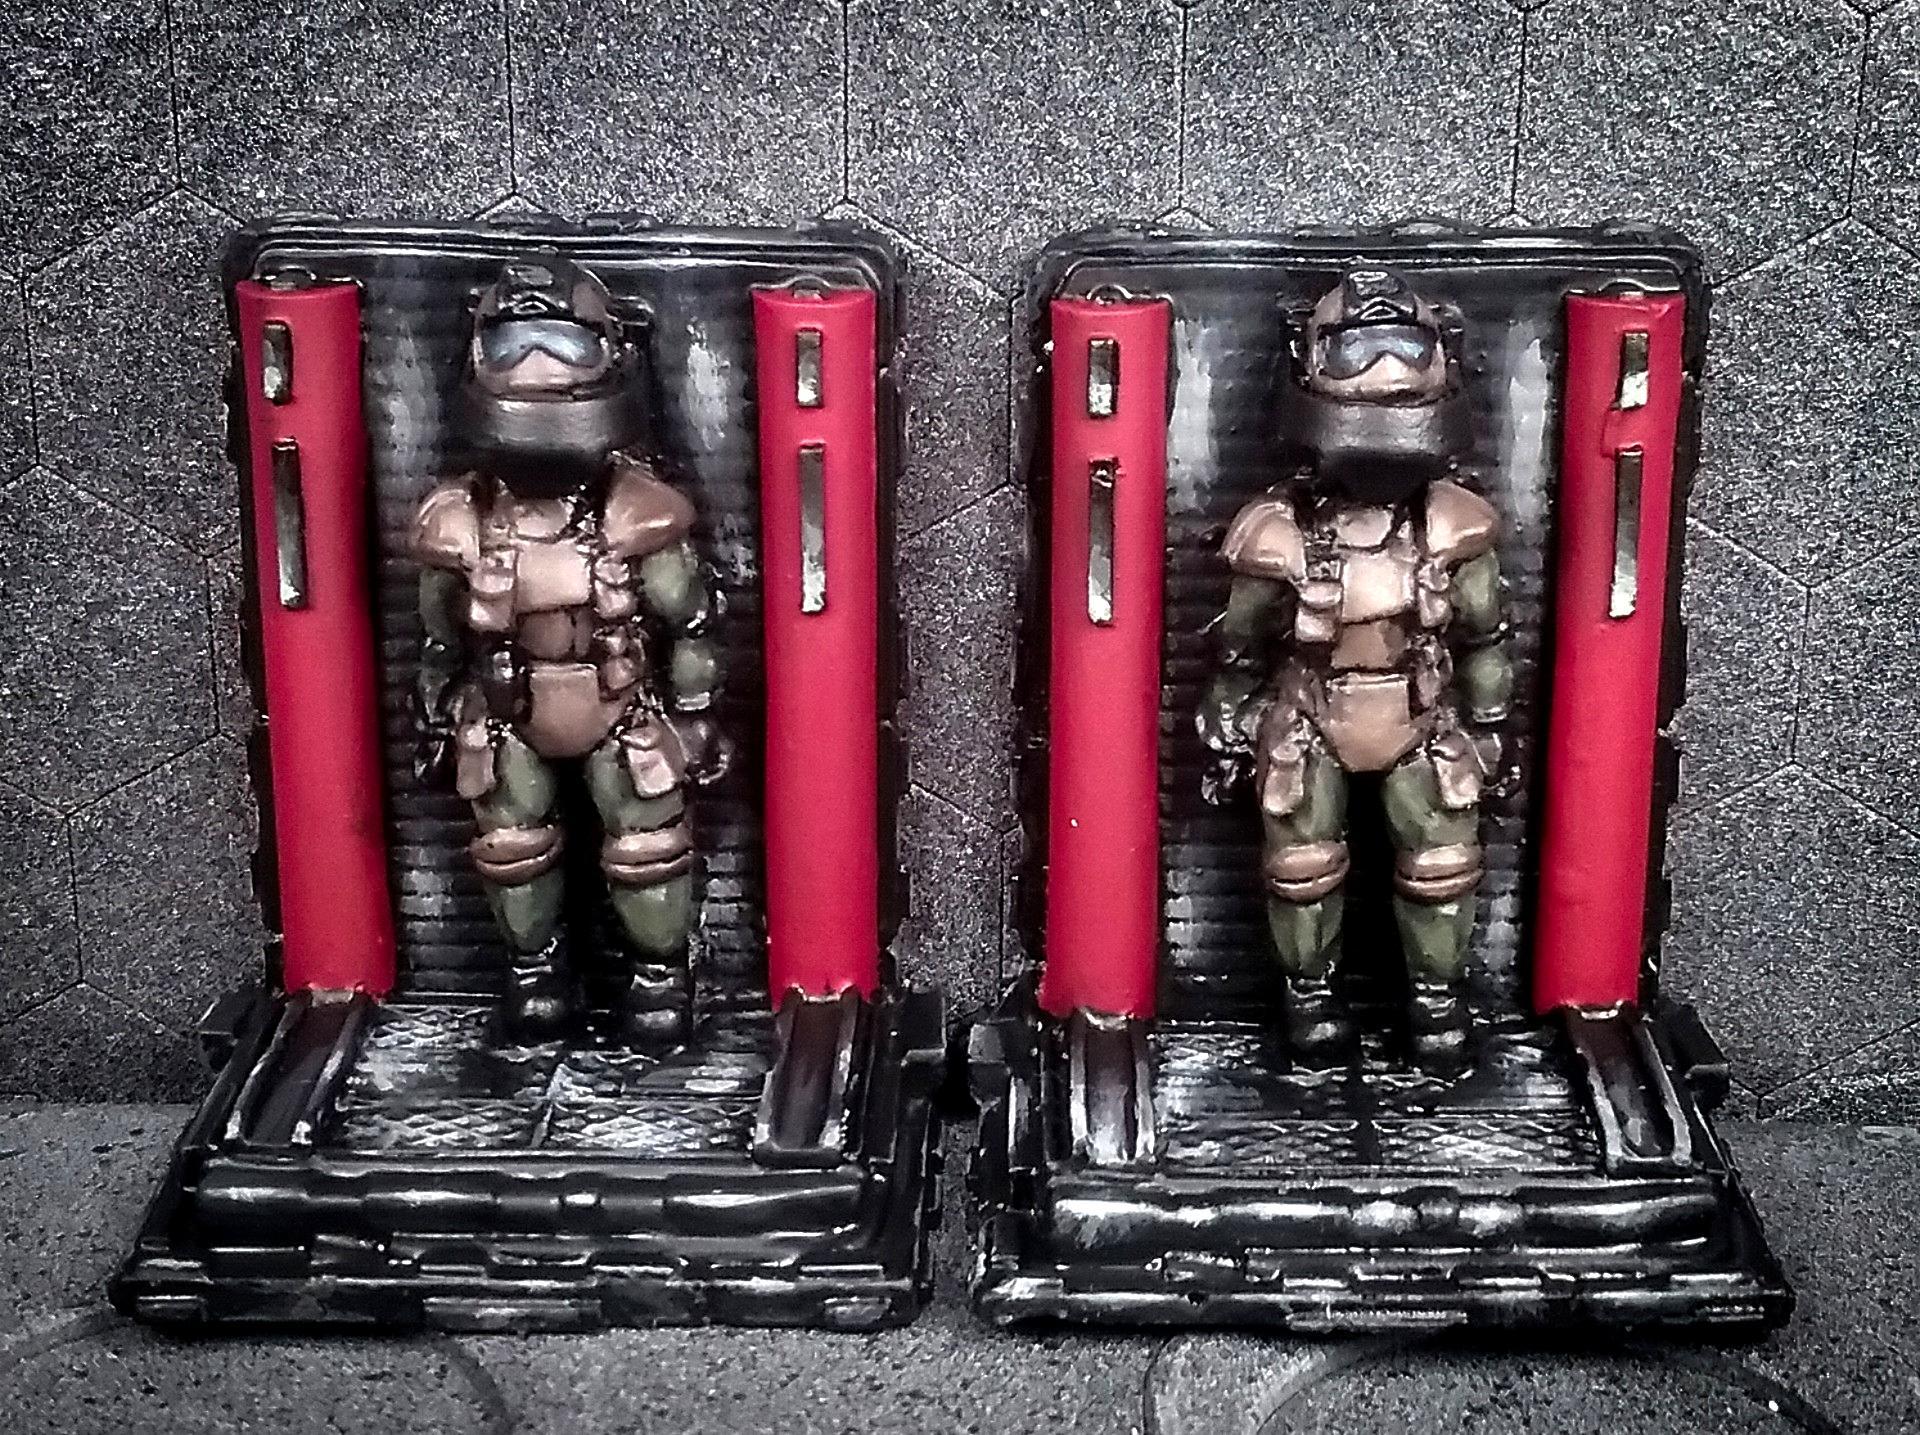 28mm Battlestar Galactica Miniatures, Ainsty Castings, Ainsty Castings Starport Terrain, Battlestar Galactica Miniatures, Flight Suits, Sci Fi Flight Suits, Sci Fi Terrain, Space Suits, Space Suits In Rack, Terrain